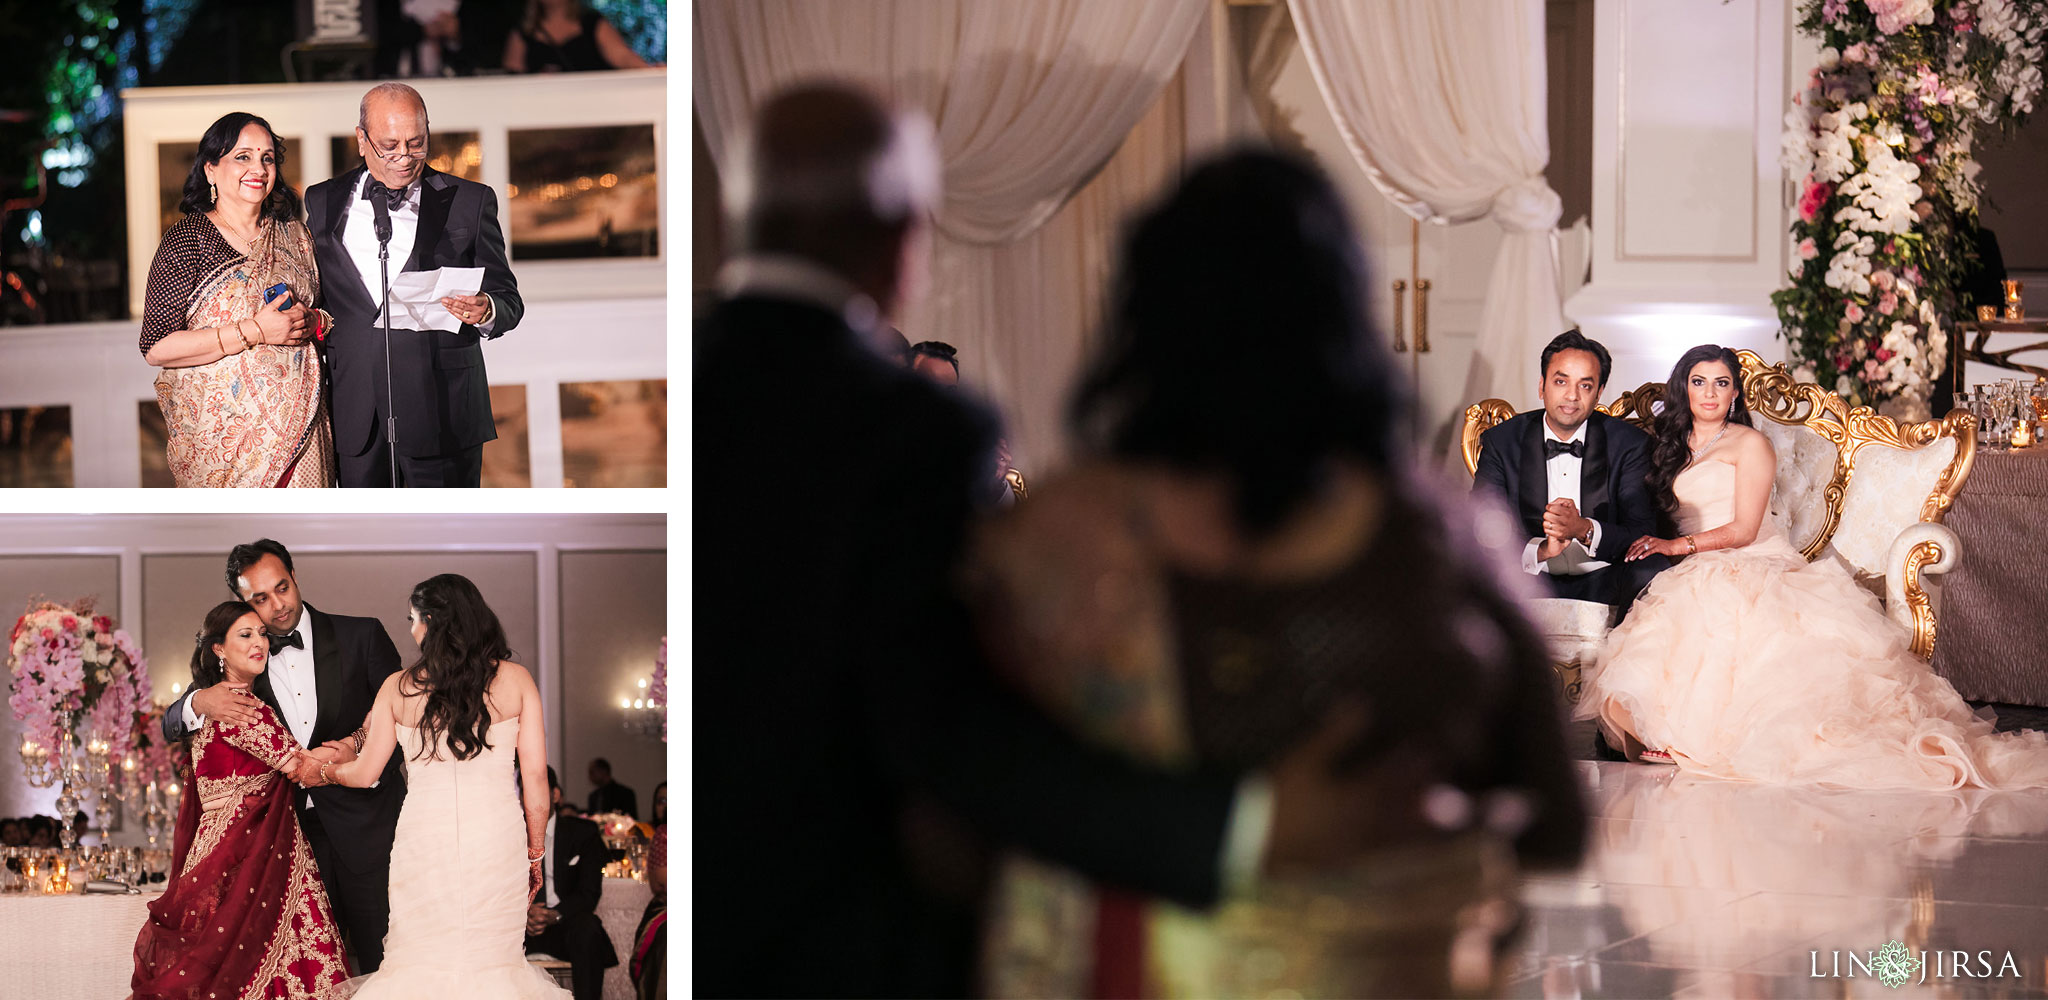 43 Ritz Carlton St Louis Missouri Indian Wedding Photography